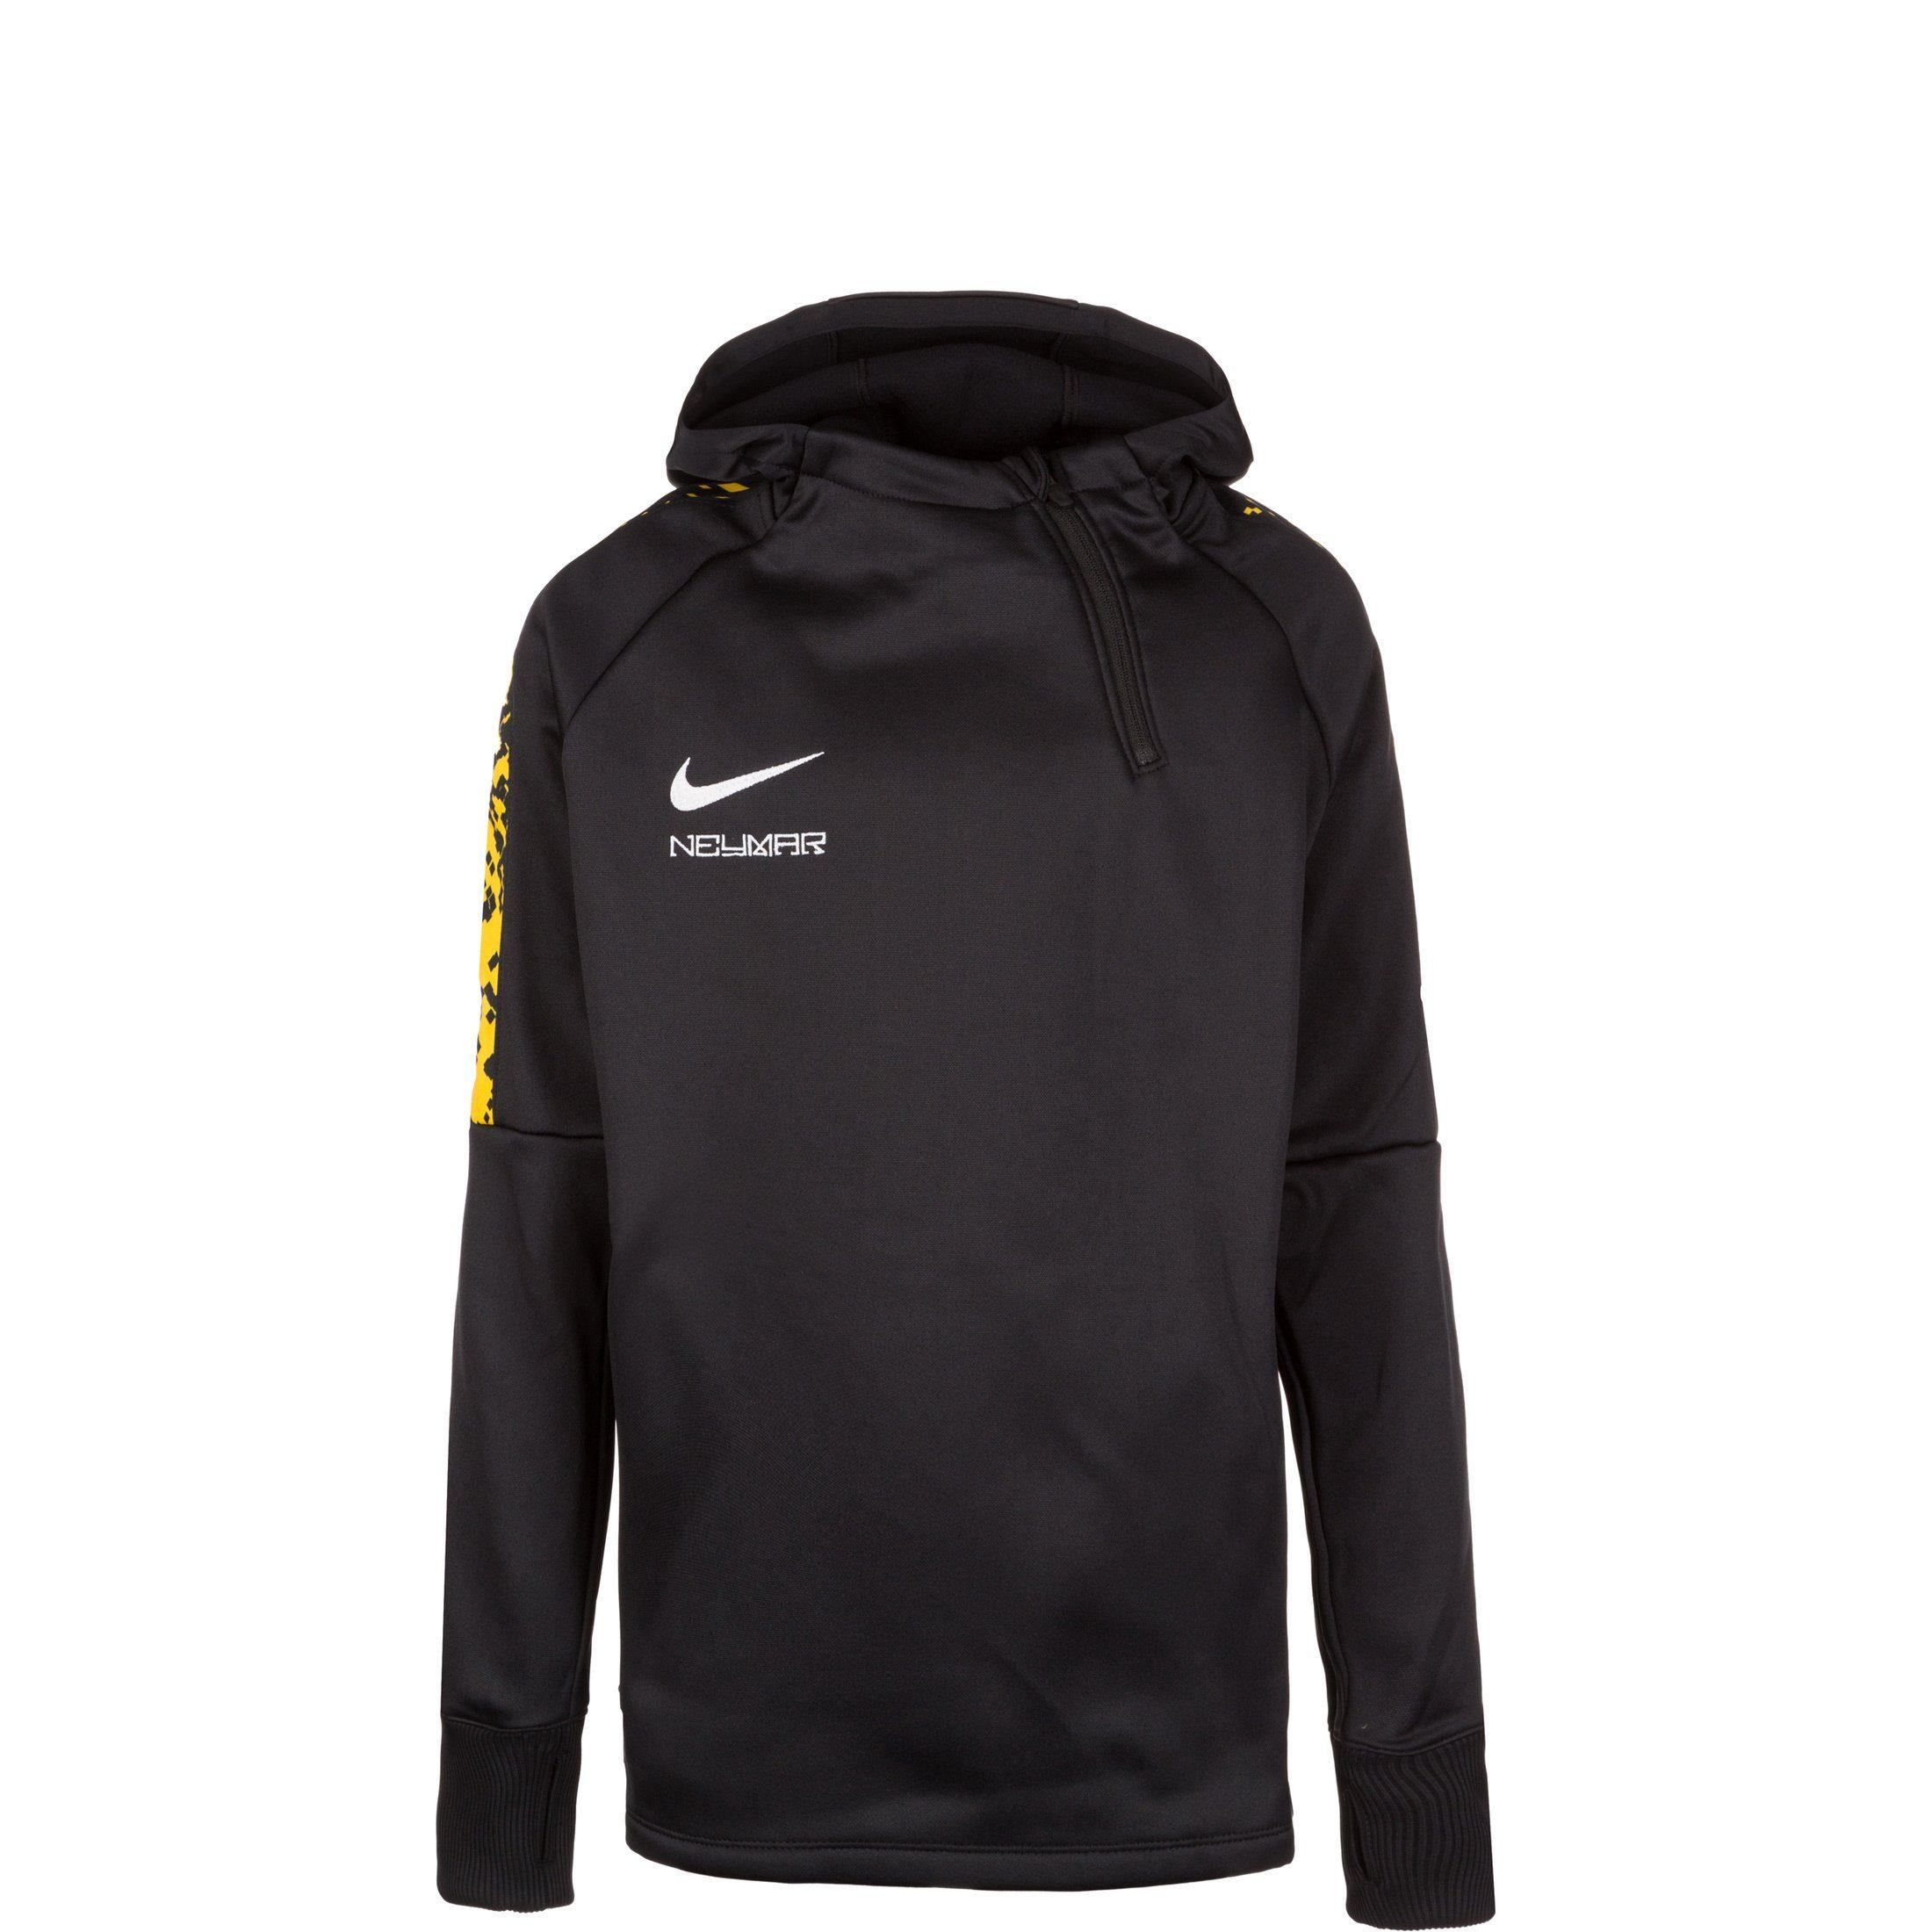 online store 14fc7 7ea72 Nike Kapuzenpullover »Neymar Therma Academy« kaufen   BAUR